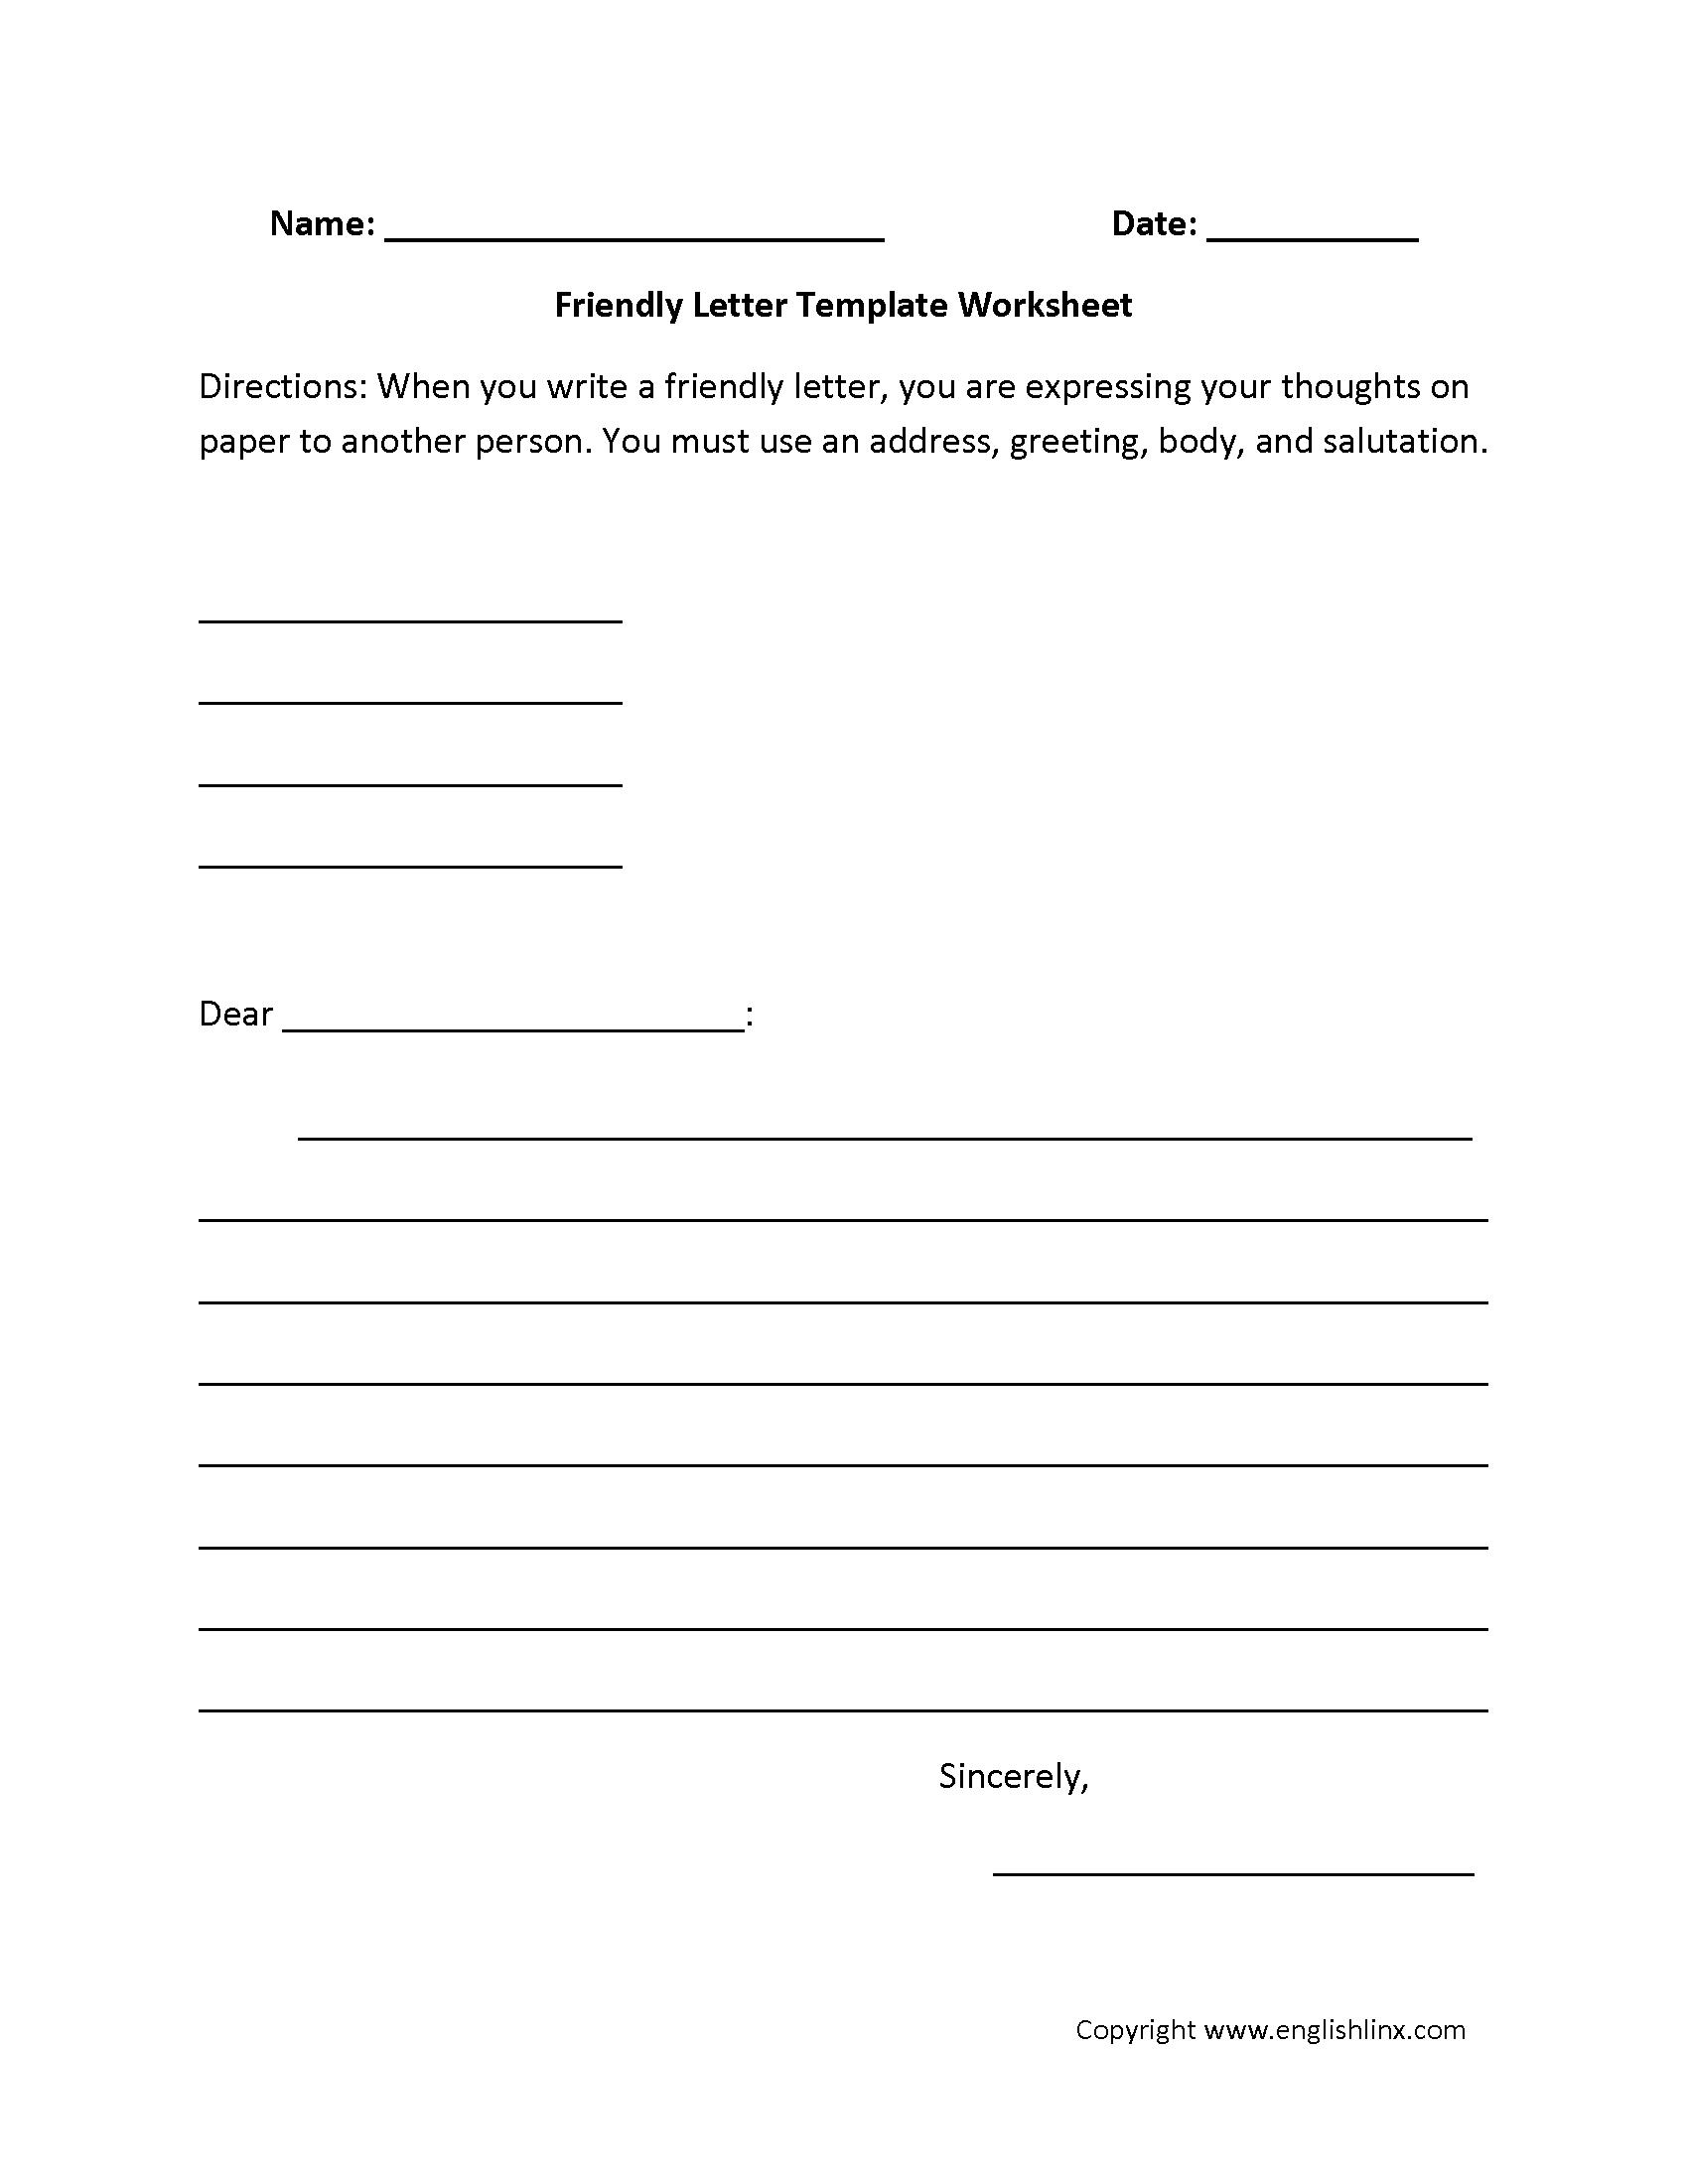 Letter Writing Worksheets | Friendly Letter Writing Worksheets